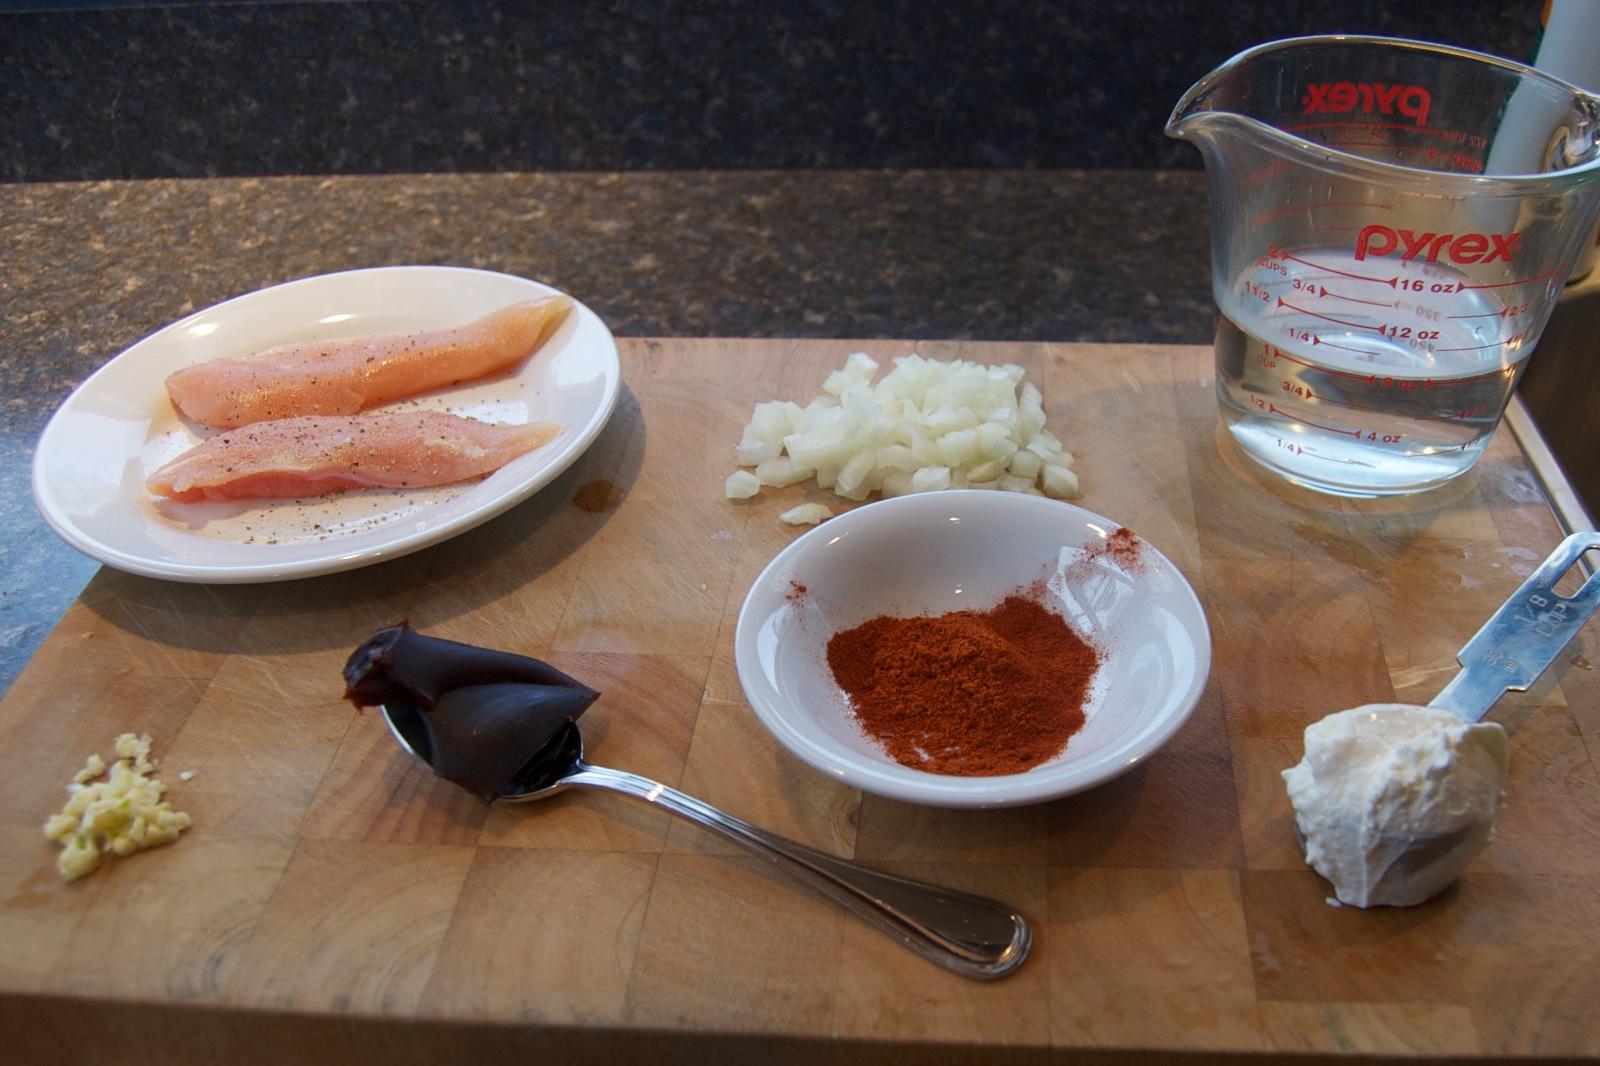 http://blog.rickk.com/food/2015/01/26/ate.2015.01.26.c6.jpg